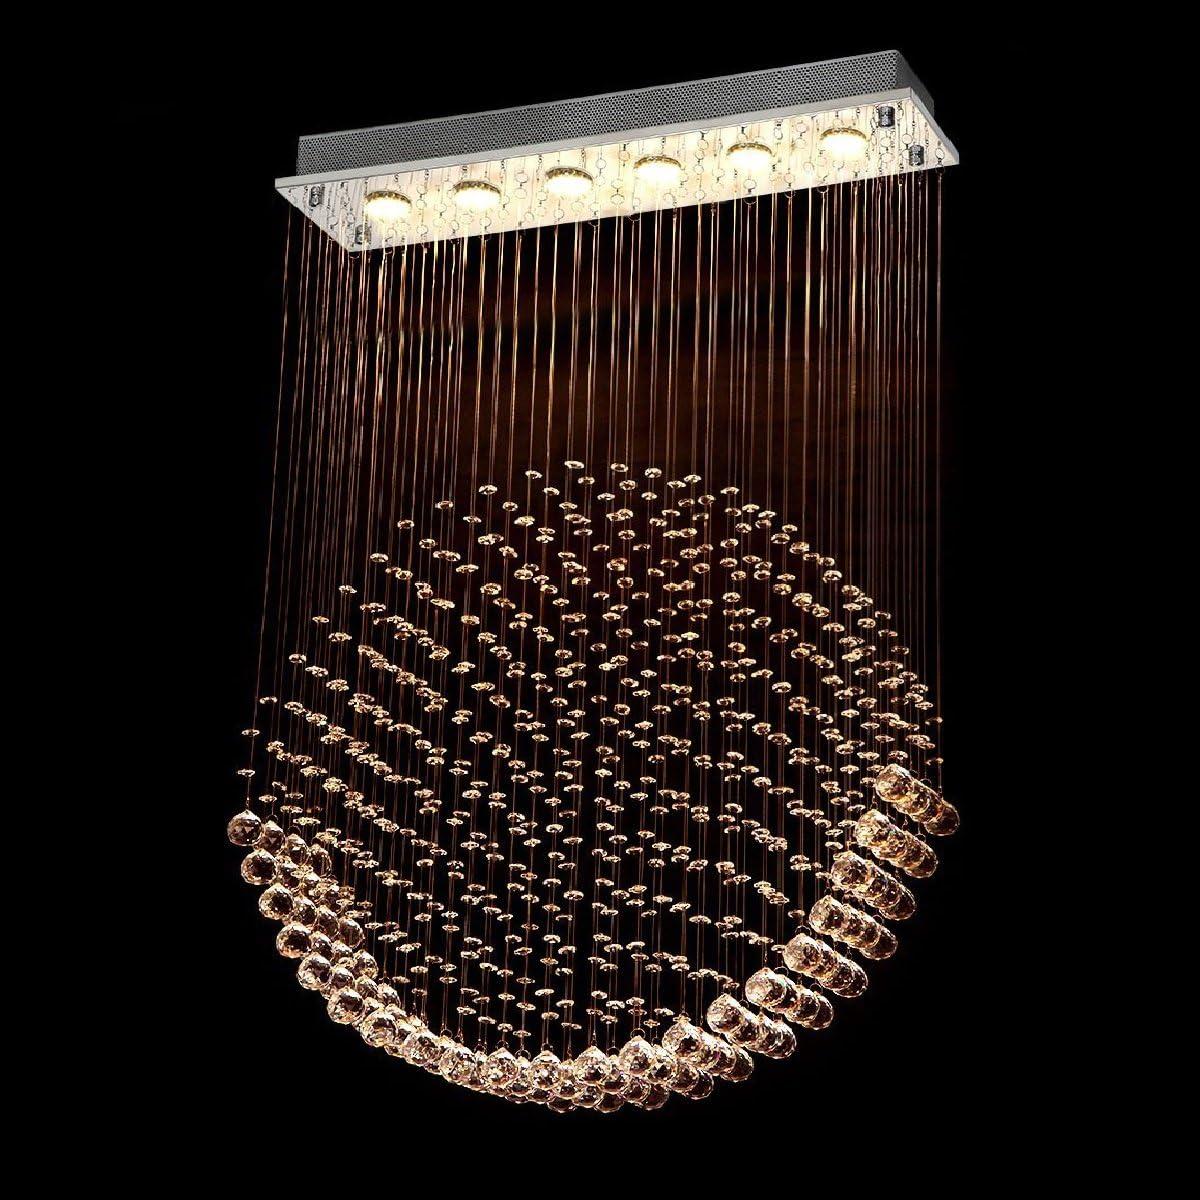 Luxurious Gorgeous Modern Contemporary Rain Drop LED Crystal Rectangle Chandelier Flush Mount Rectangle Rain Drop Ceiling Light Fixtures L40 X W10 X H51 6 Lights Round